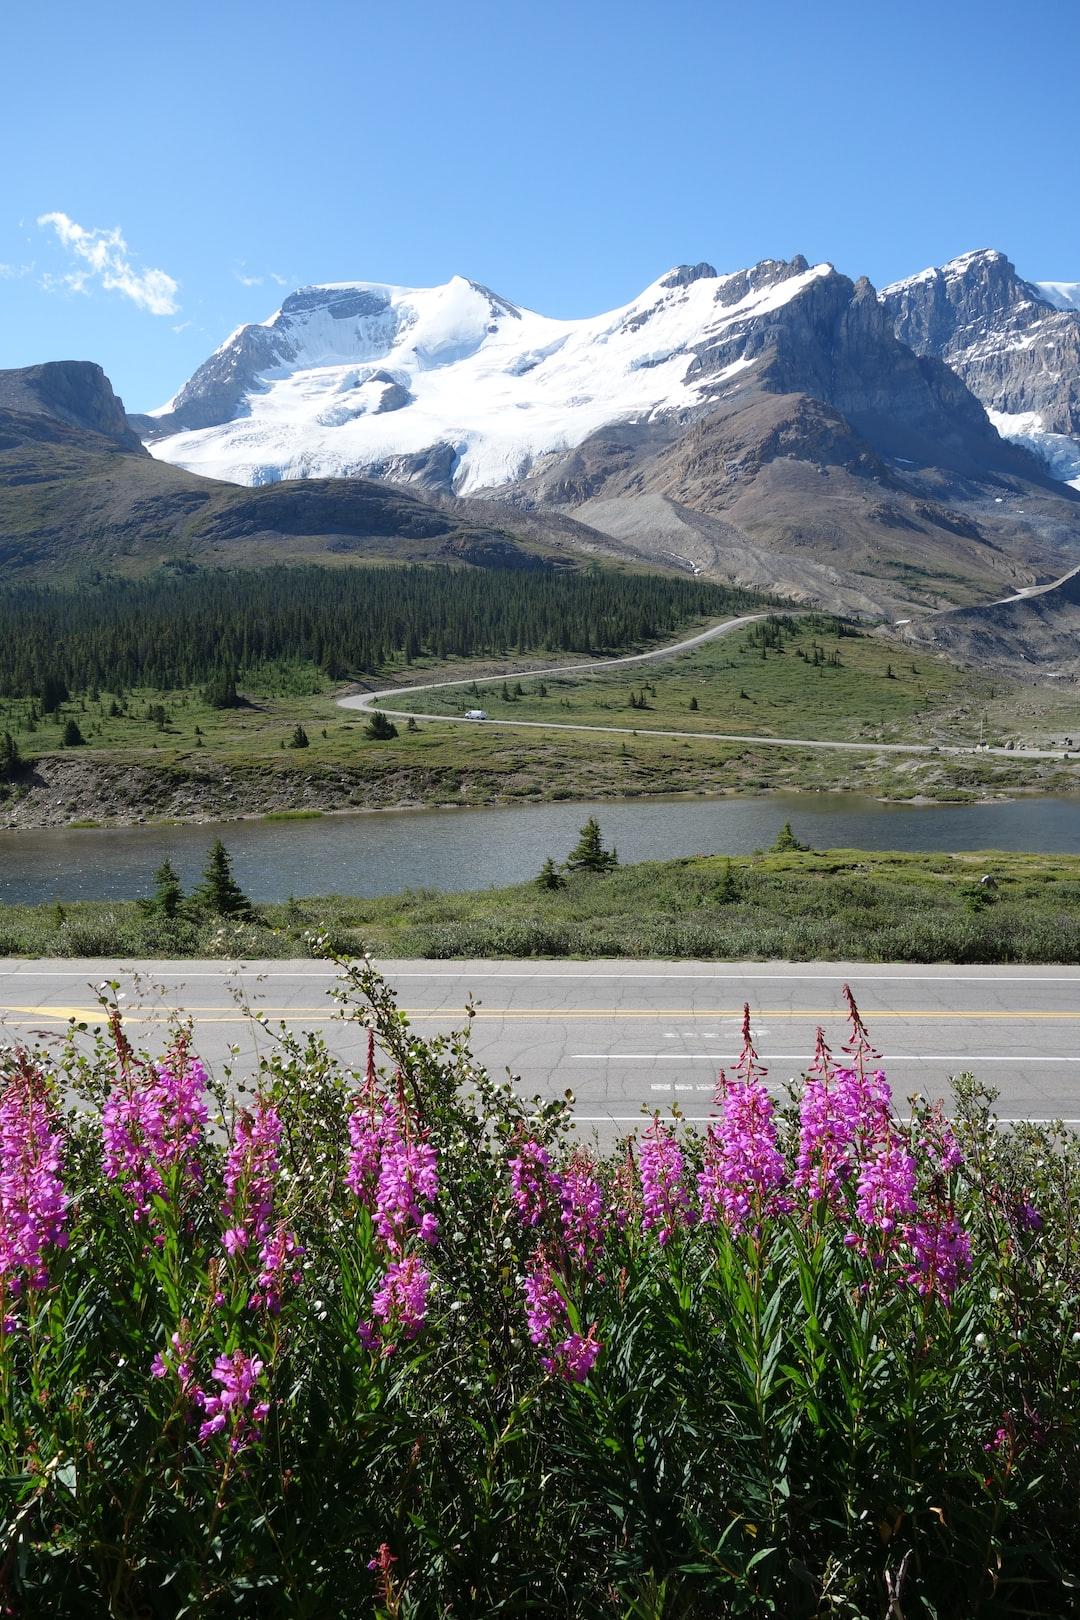 Athabasca Glacier, Columbia Icefield, Canada